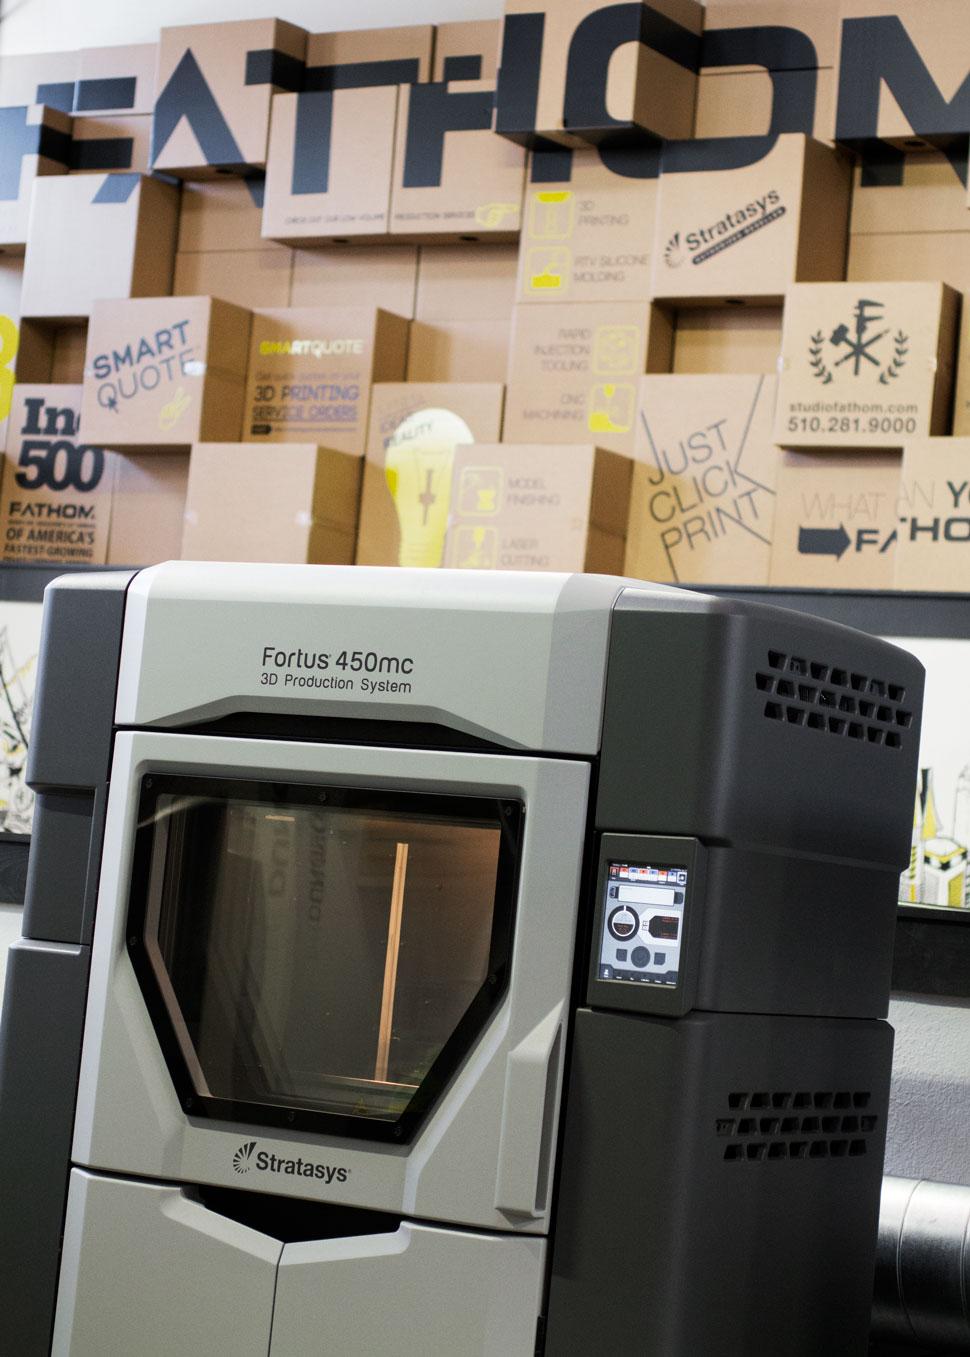 Fortus-3D-Printers-Stratasys-FATHOM-Vert1